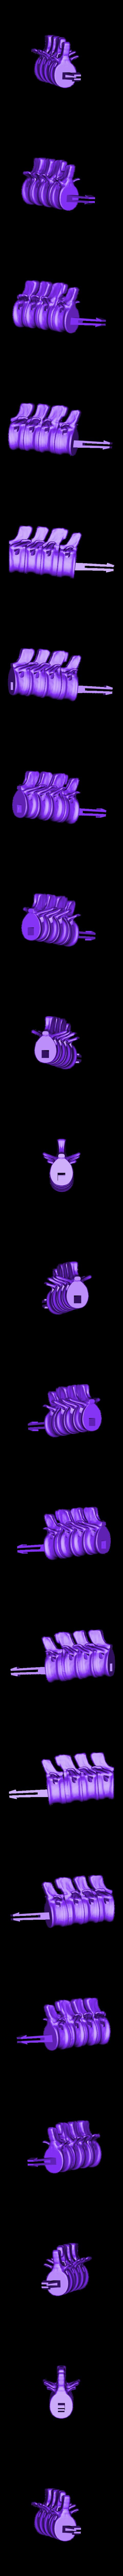 TRex_Dorsal_2.stl Download free STL file T-Rex Skeleton - Leo Burton Mount • 3D printing design, HarryHistory